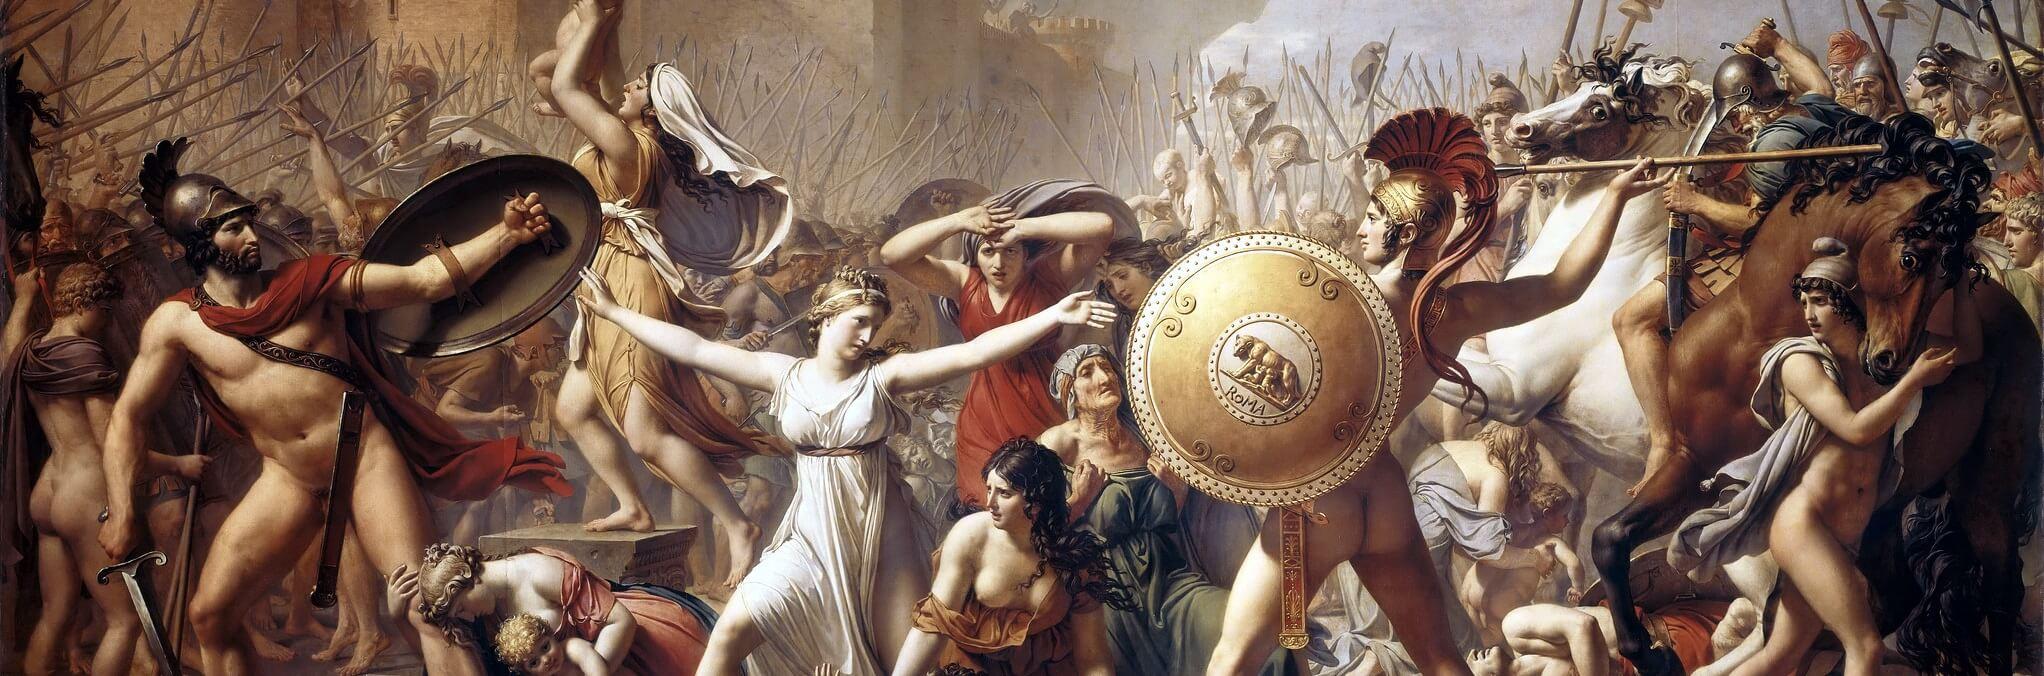 Artyści - Jacques-Louis David